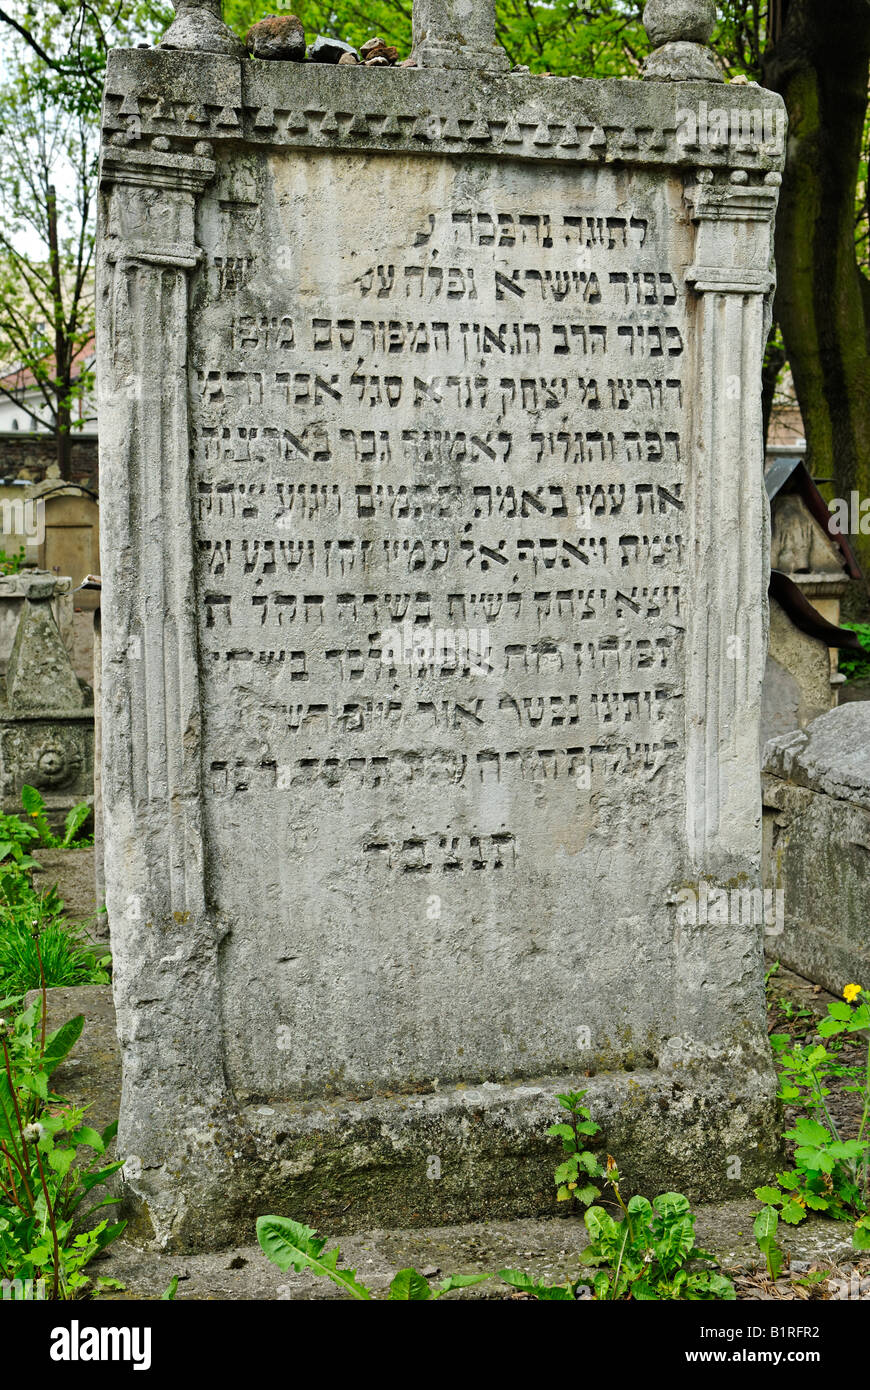 Gravestone with Hebrew inscription, Jewish cemetery Remuh, Kazimierz, UNESCO World Heritage Site, Kraków, Poland, - Stock Image